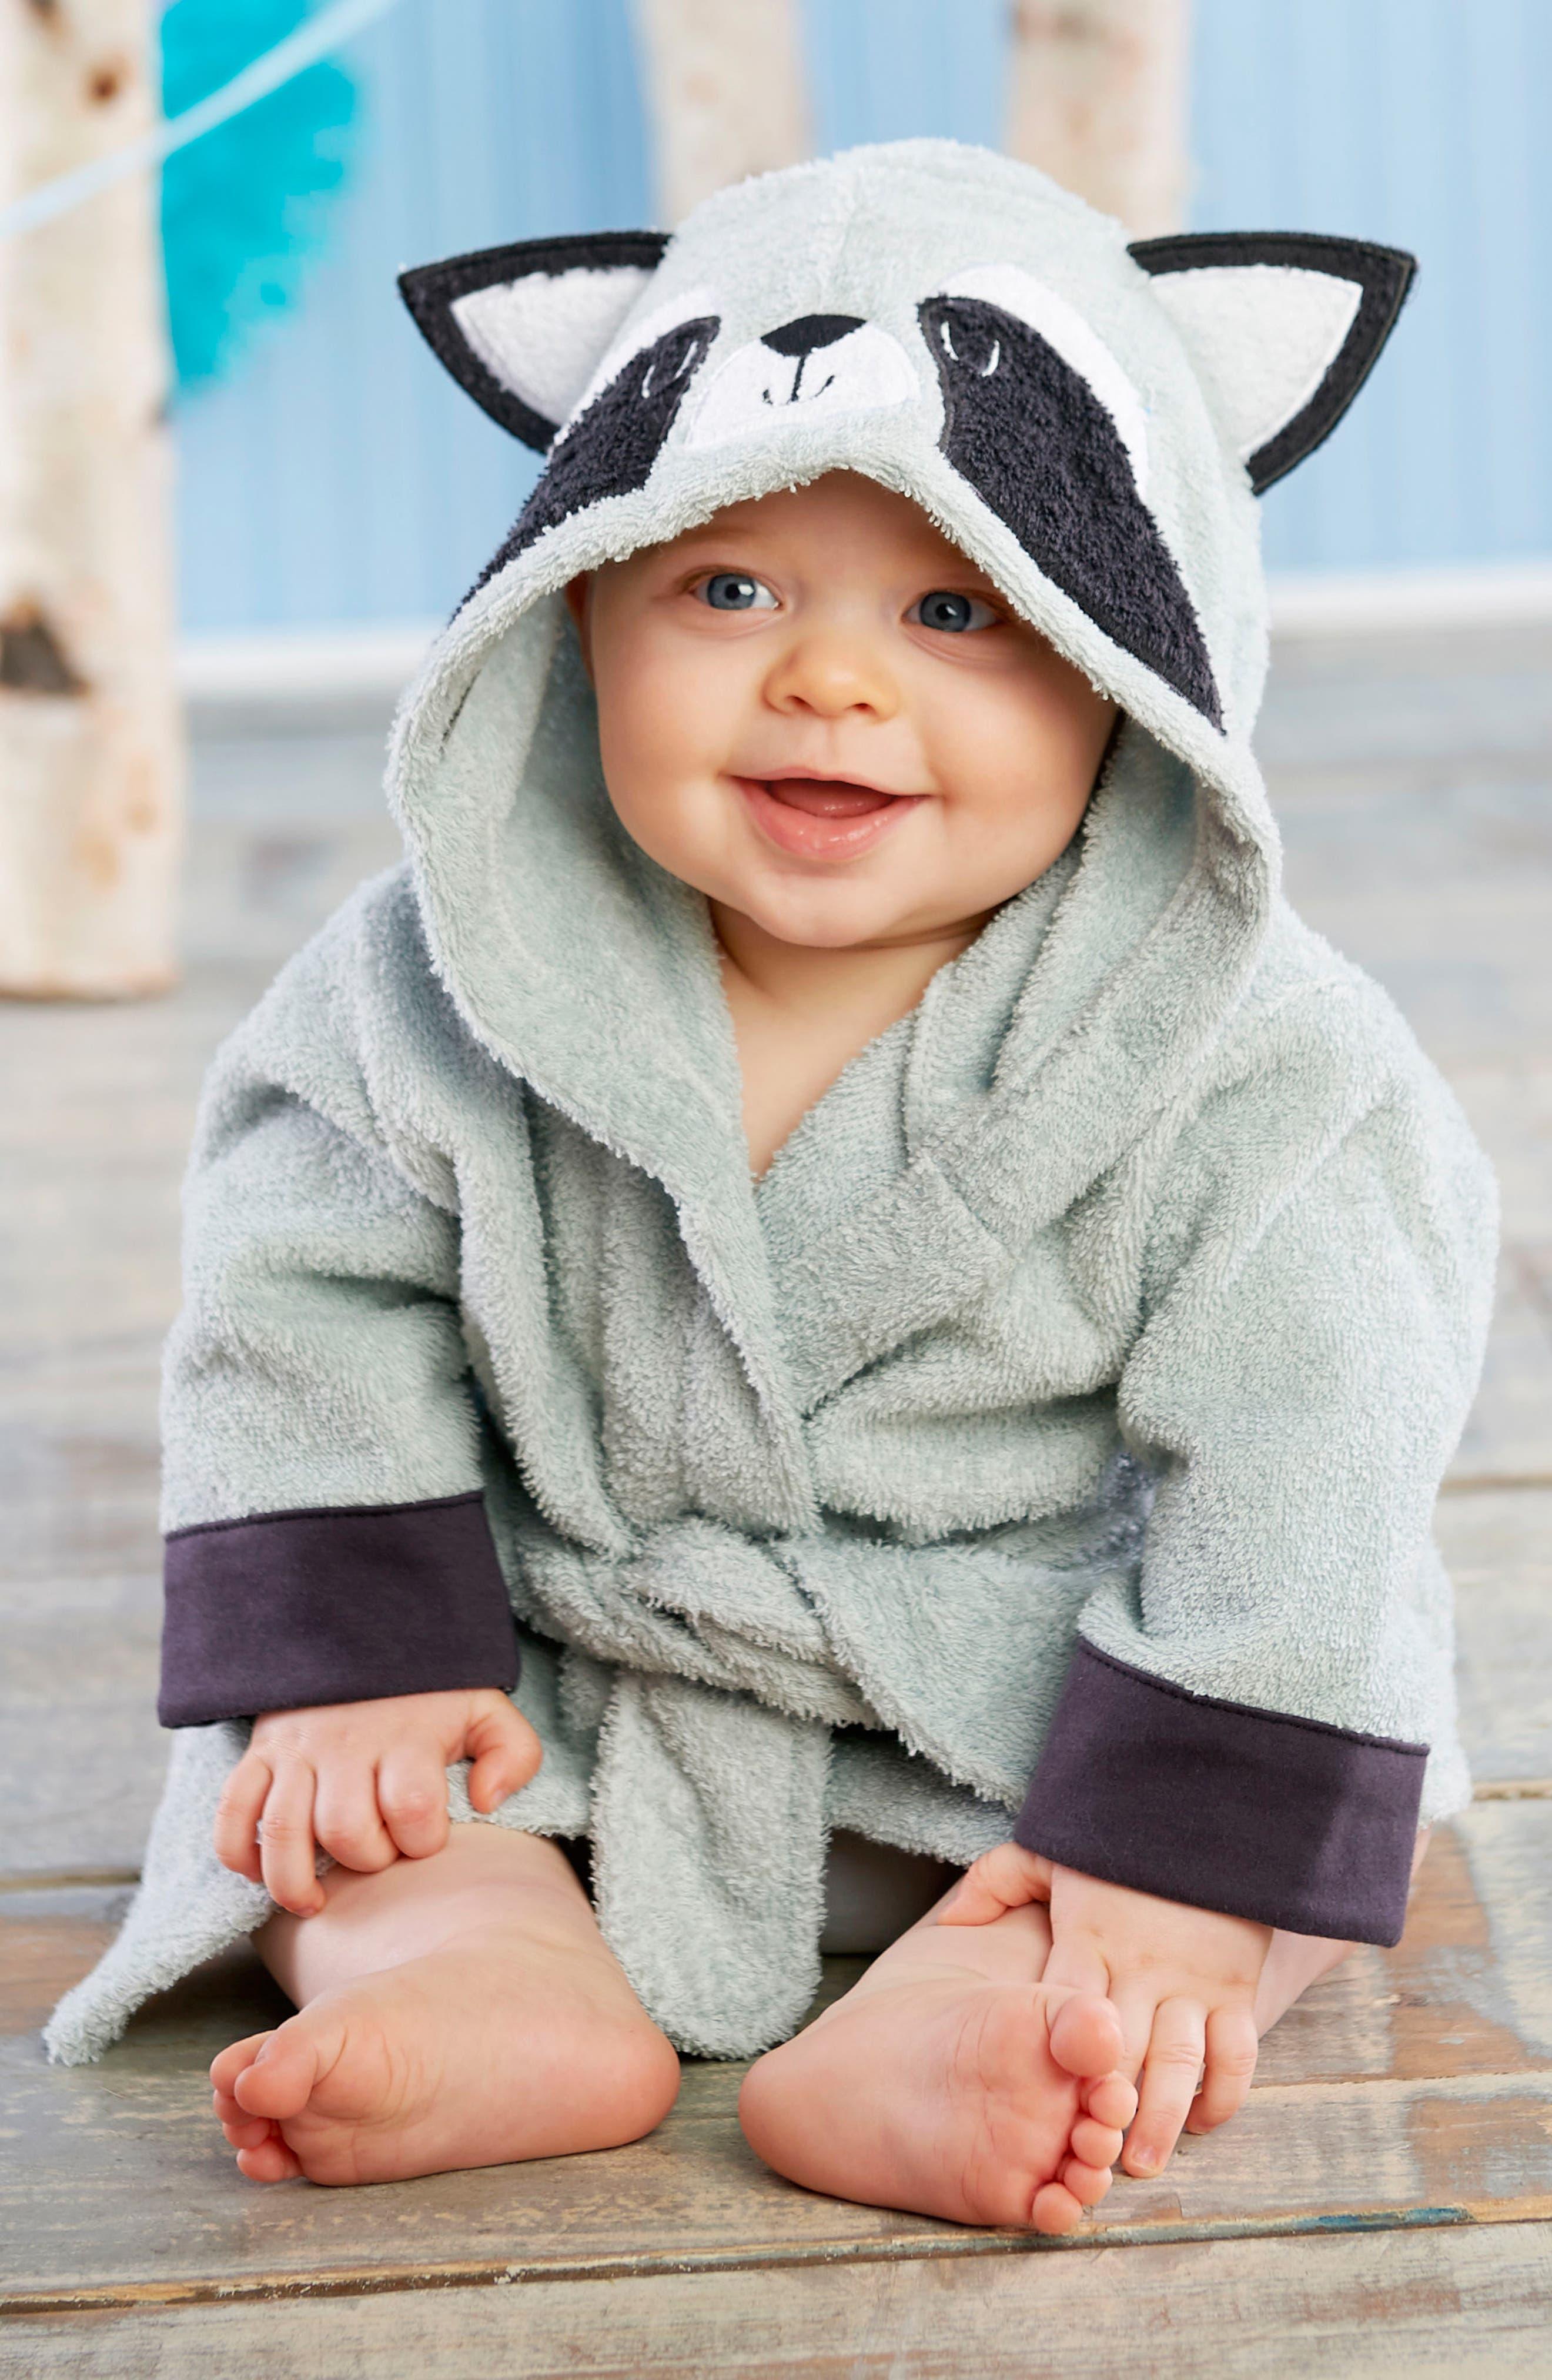 Forest Friends Raccoon Plush Robe, Fuzzy Socks, Stuffed Animal & Rattle Set,                             Alternate thumbnail 3, color,